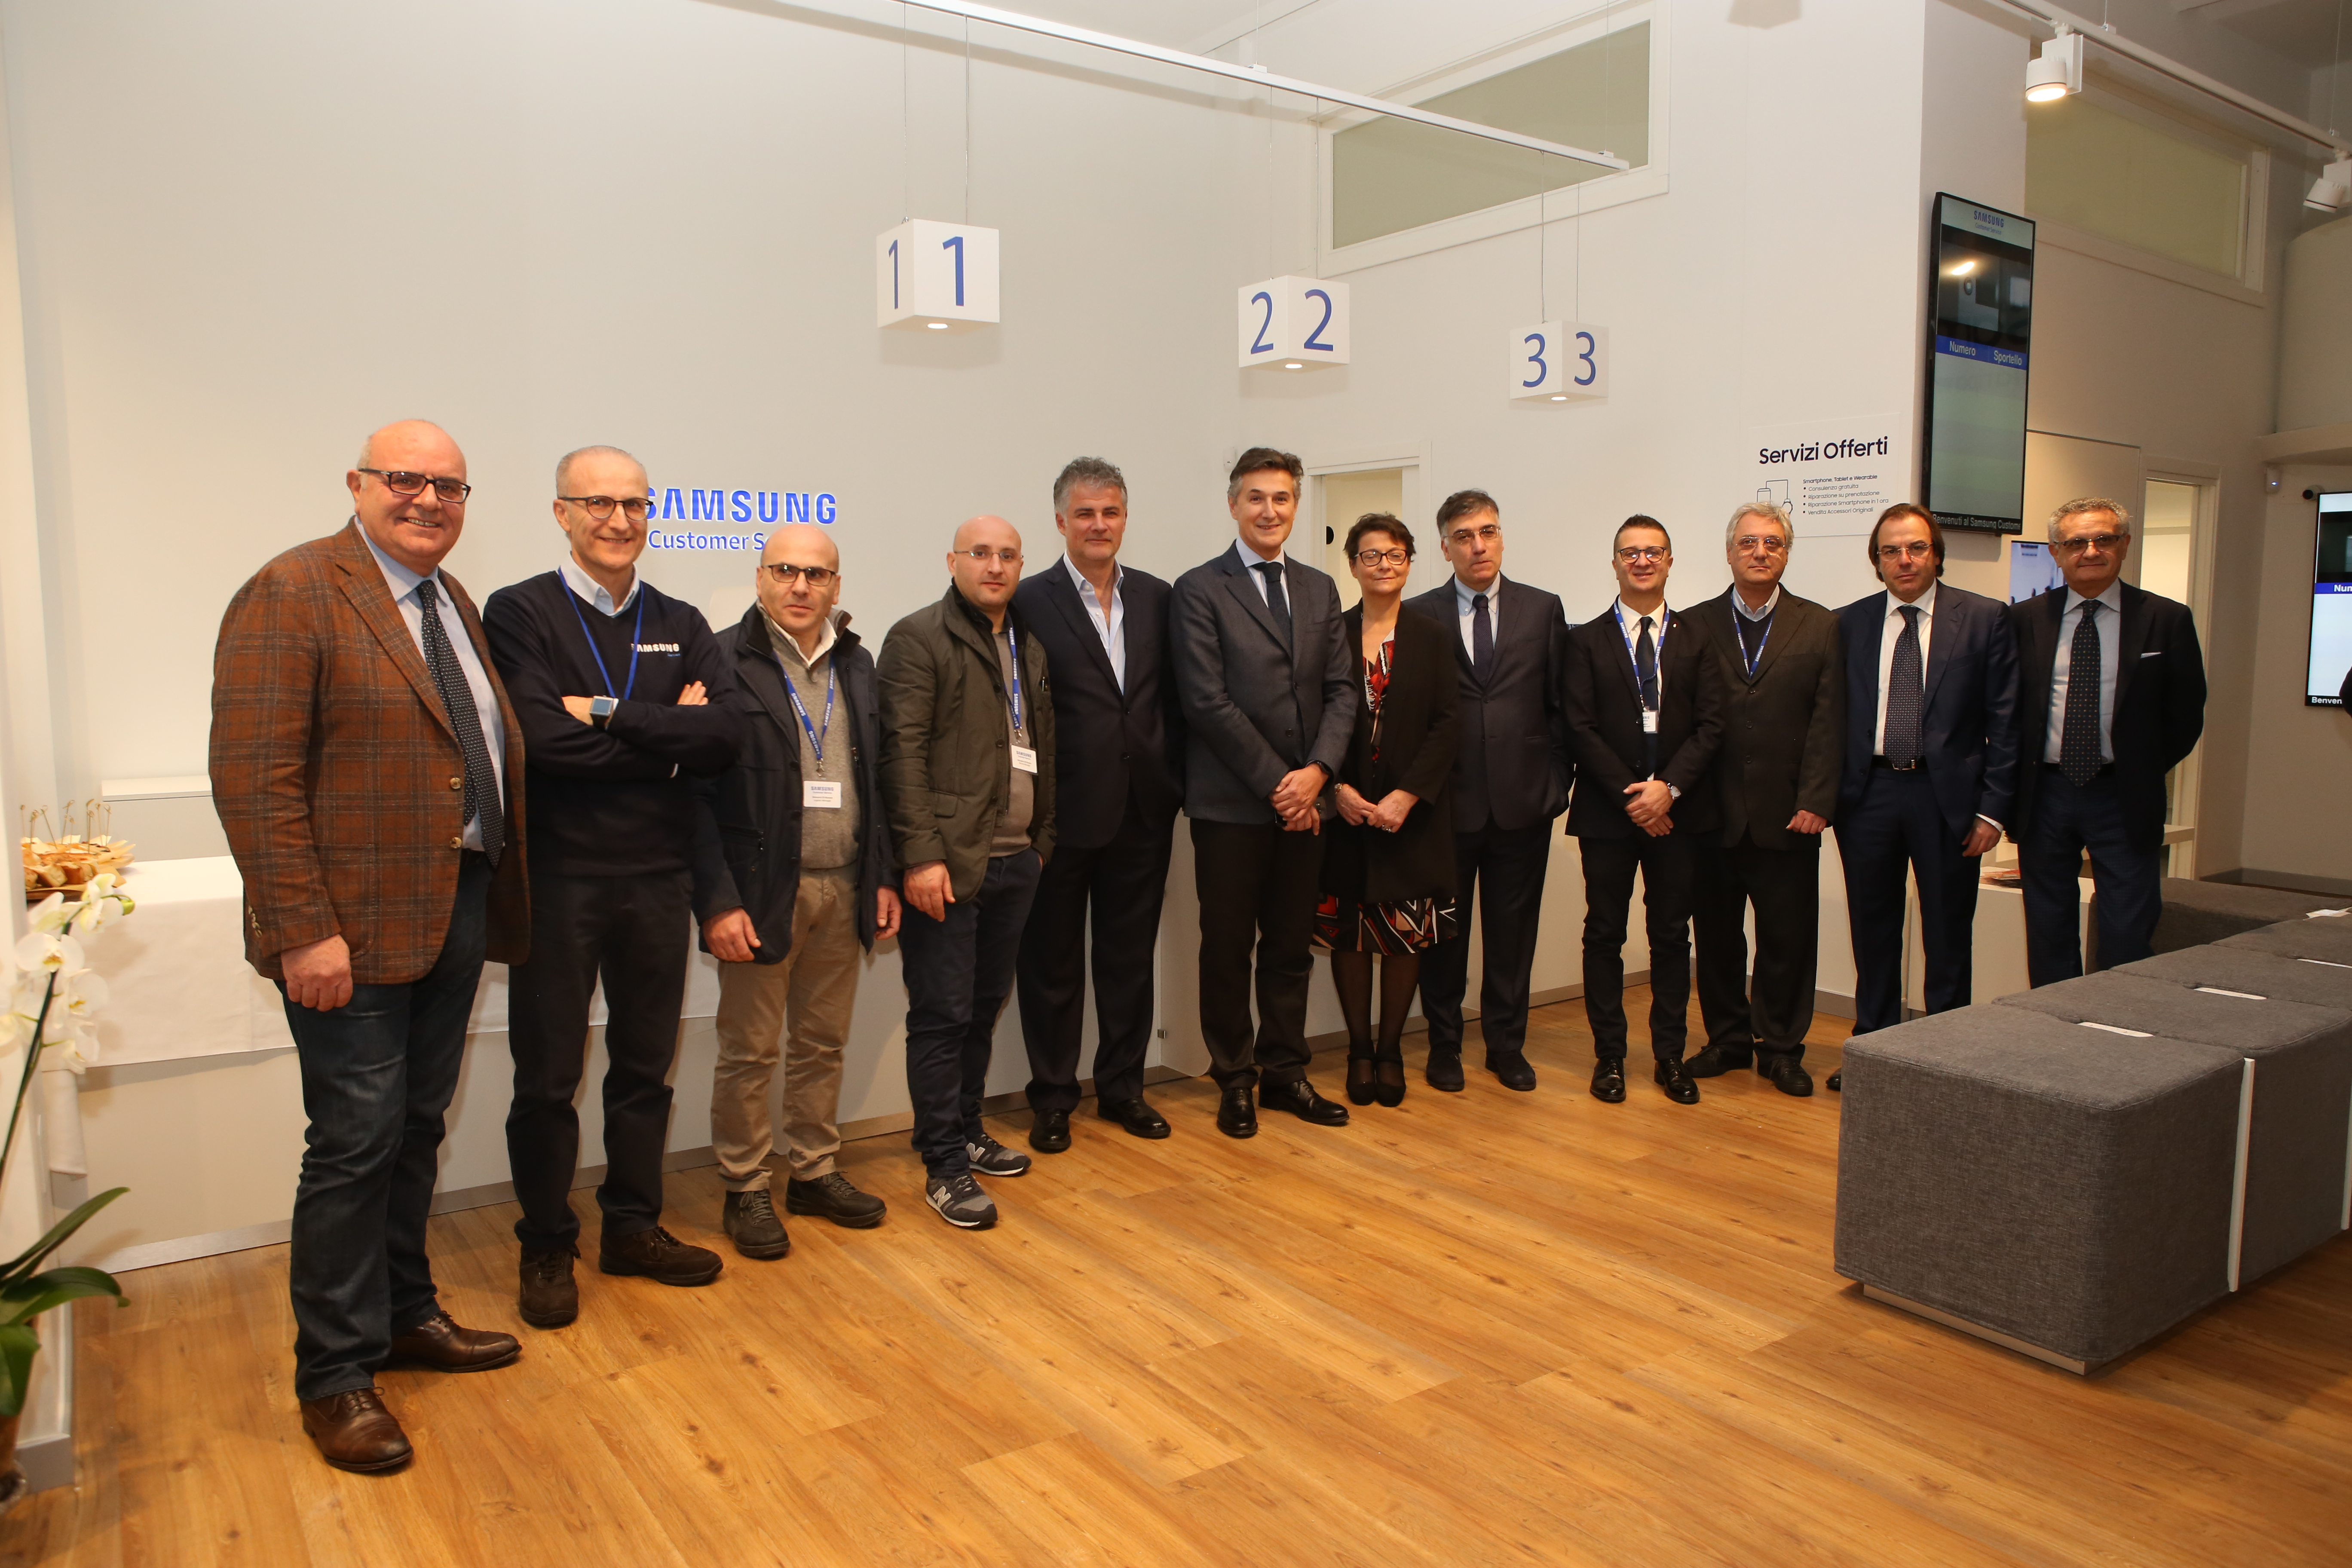 Assistenza Samsung Napoli Vomero.Apre A Napoli Il Samsung Customer Service Samsung Newsroom